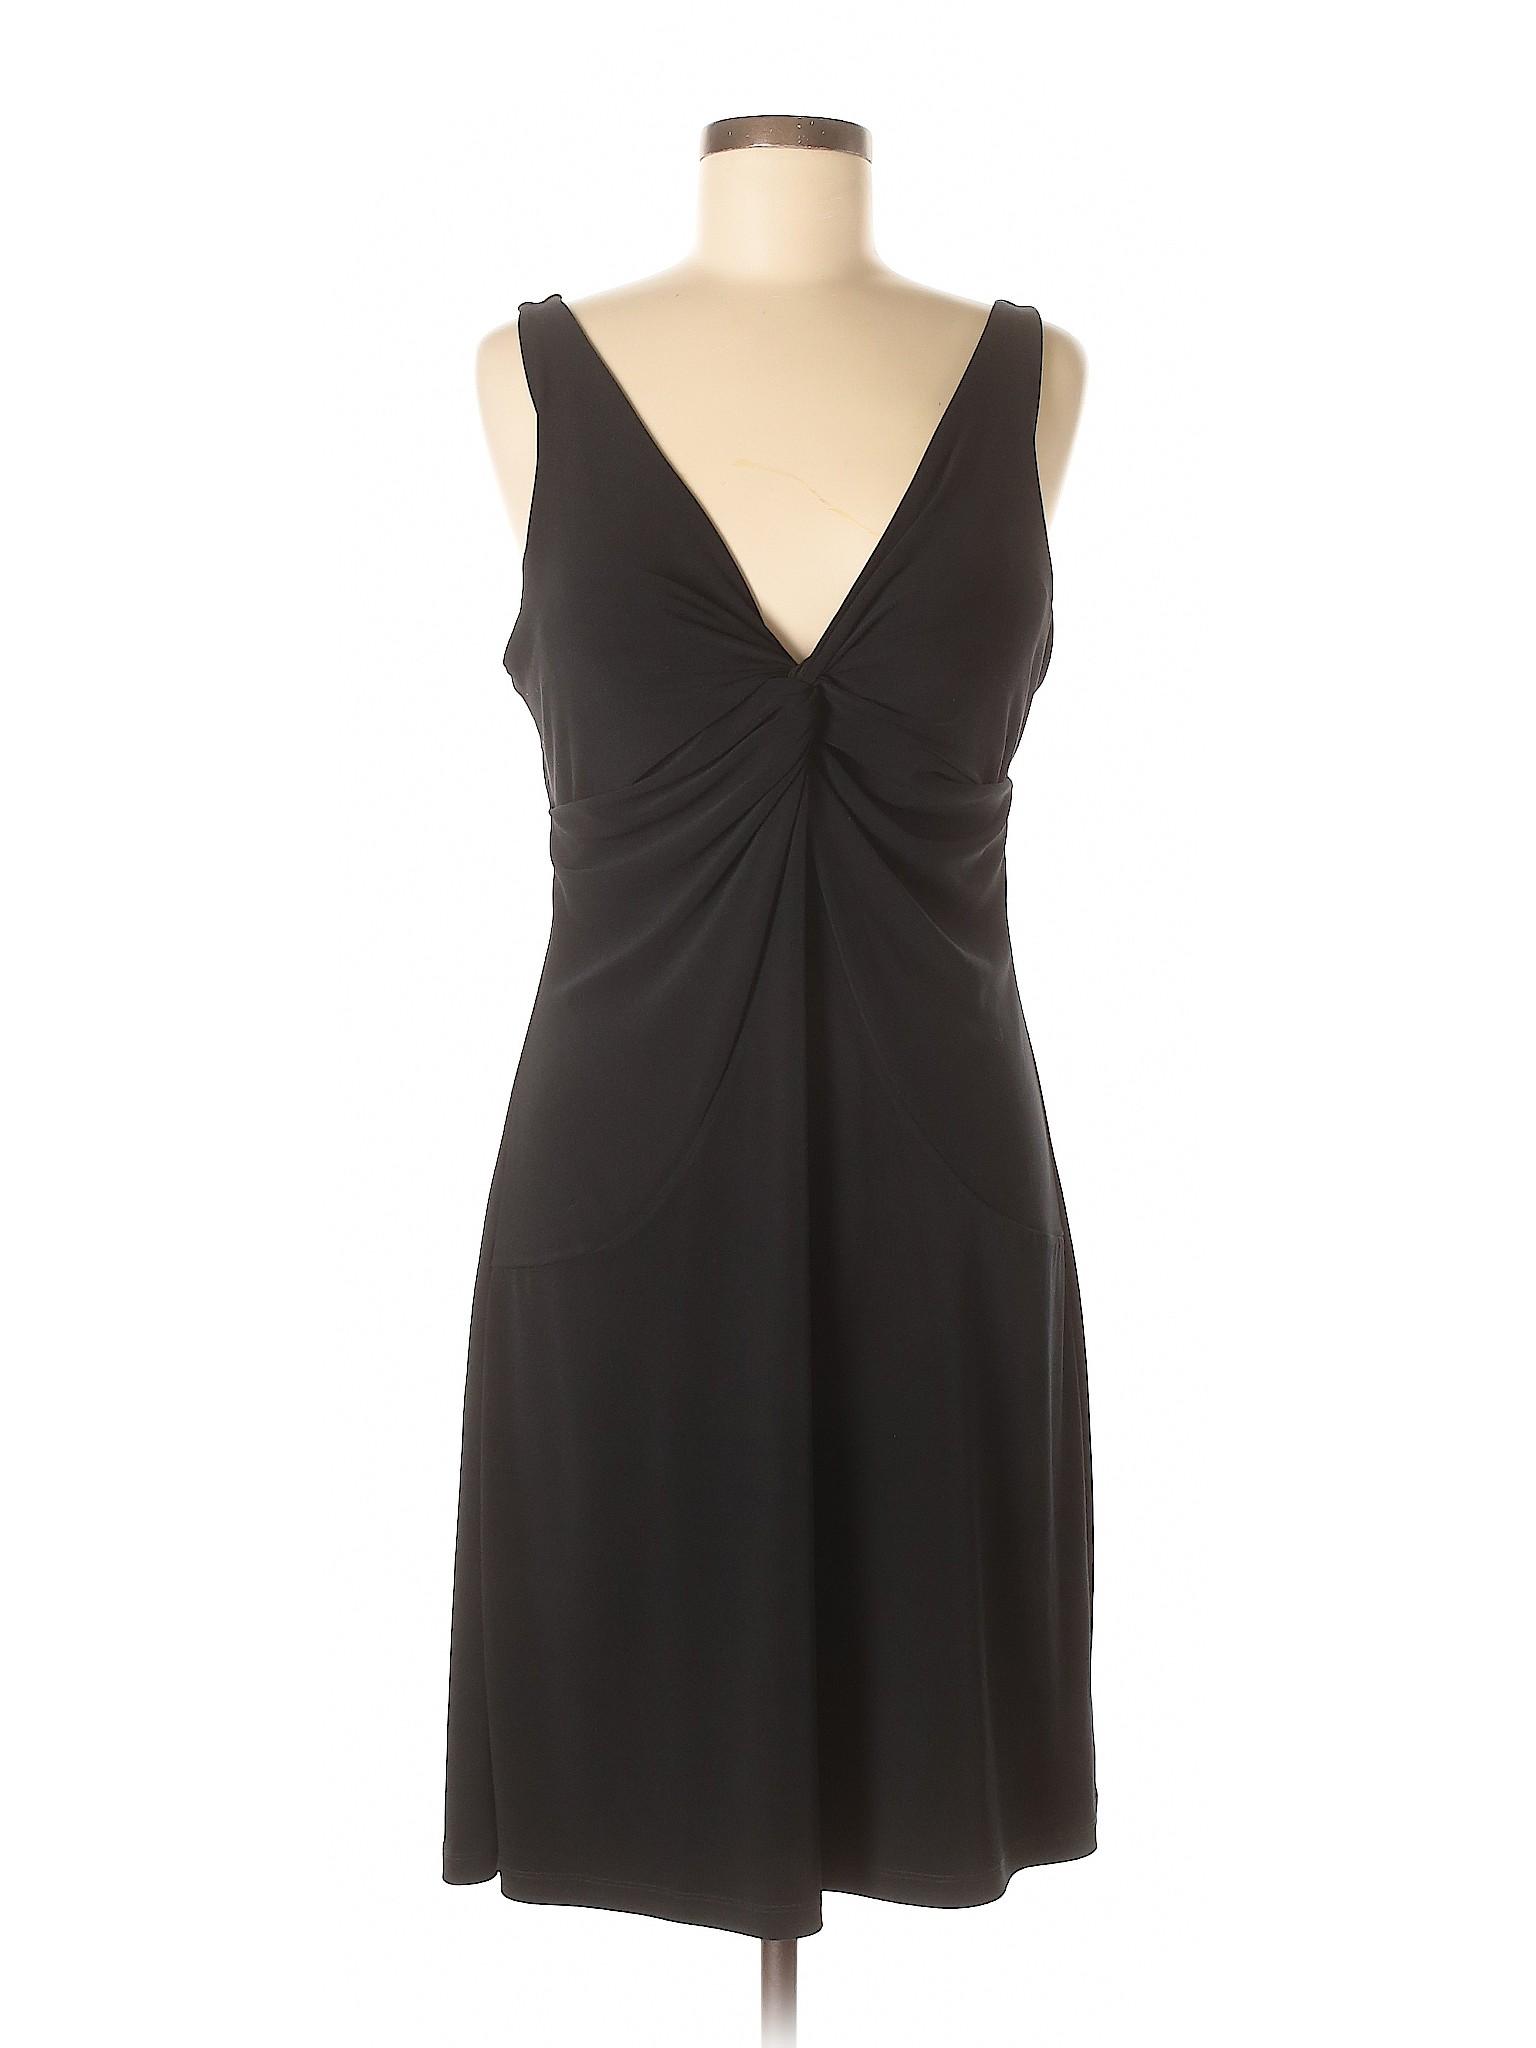 Casual Boutique International winter Dress Moda qTz7w7Y0